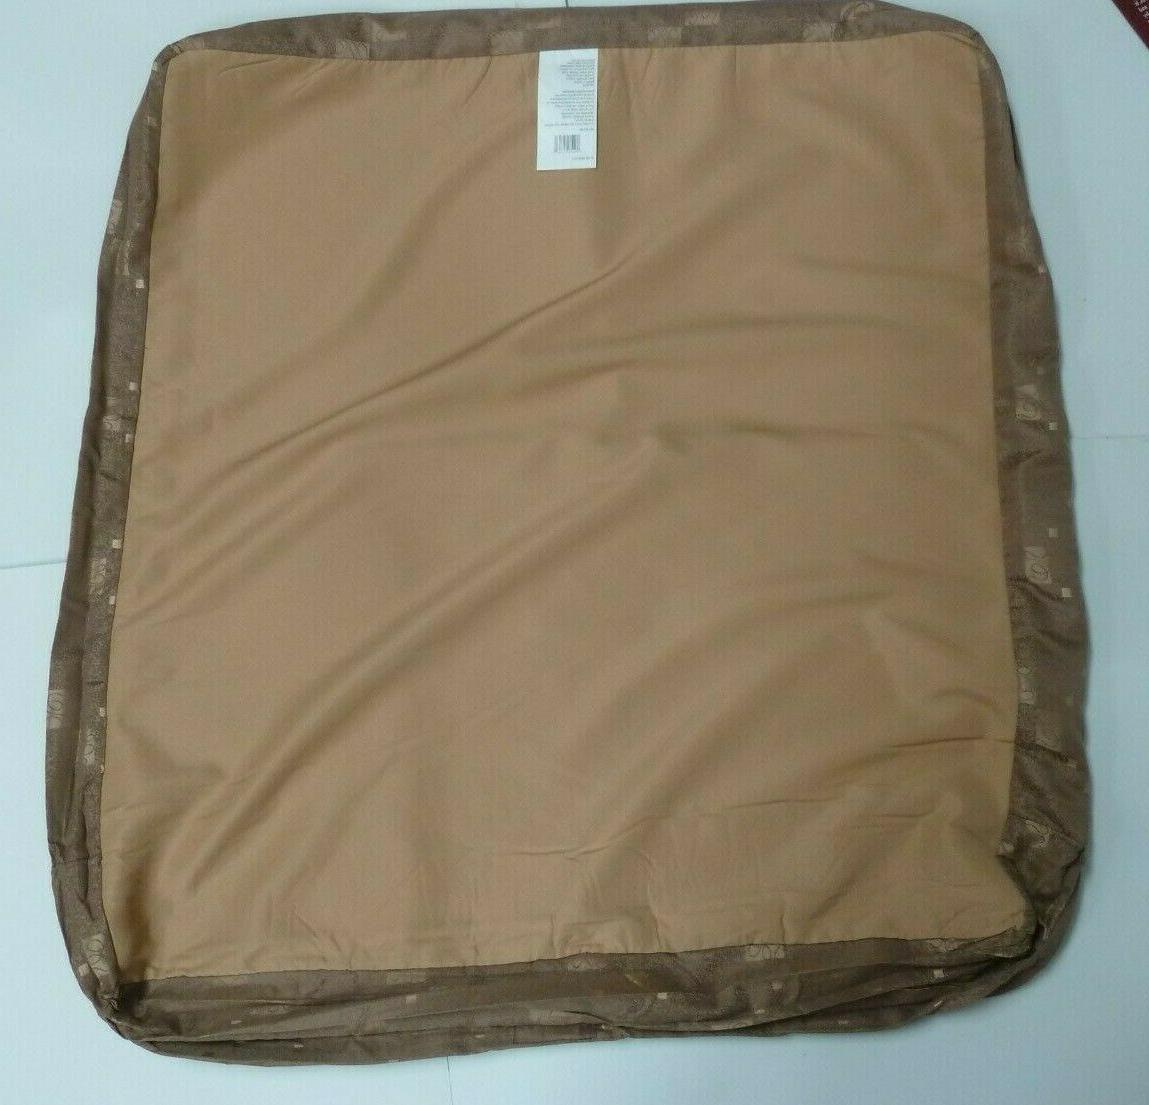 KIRKLAND Durable Fabric Zipper Cover Large Brown